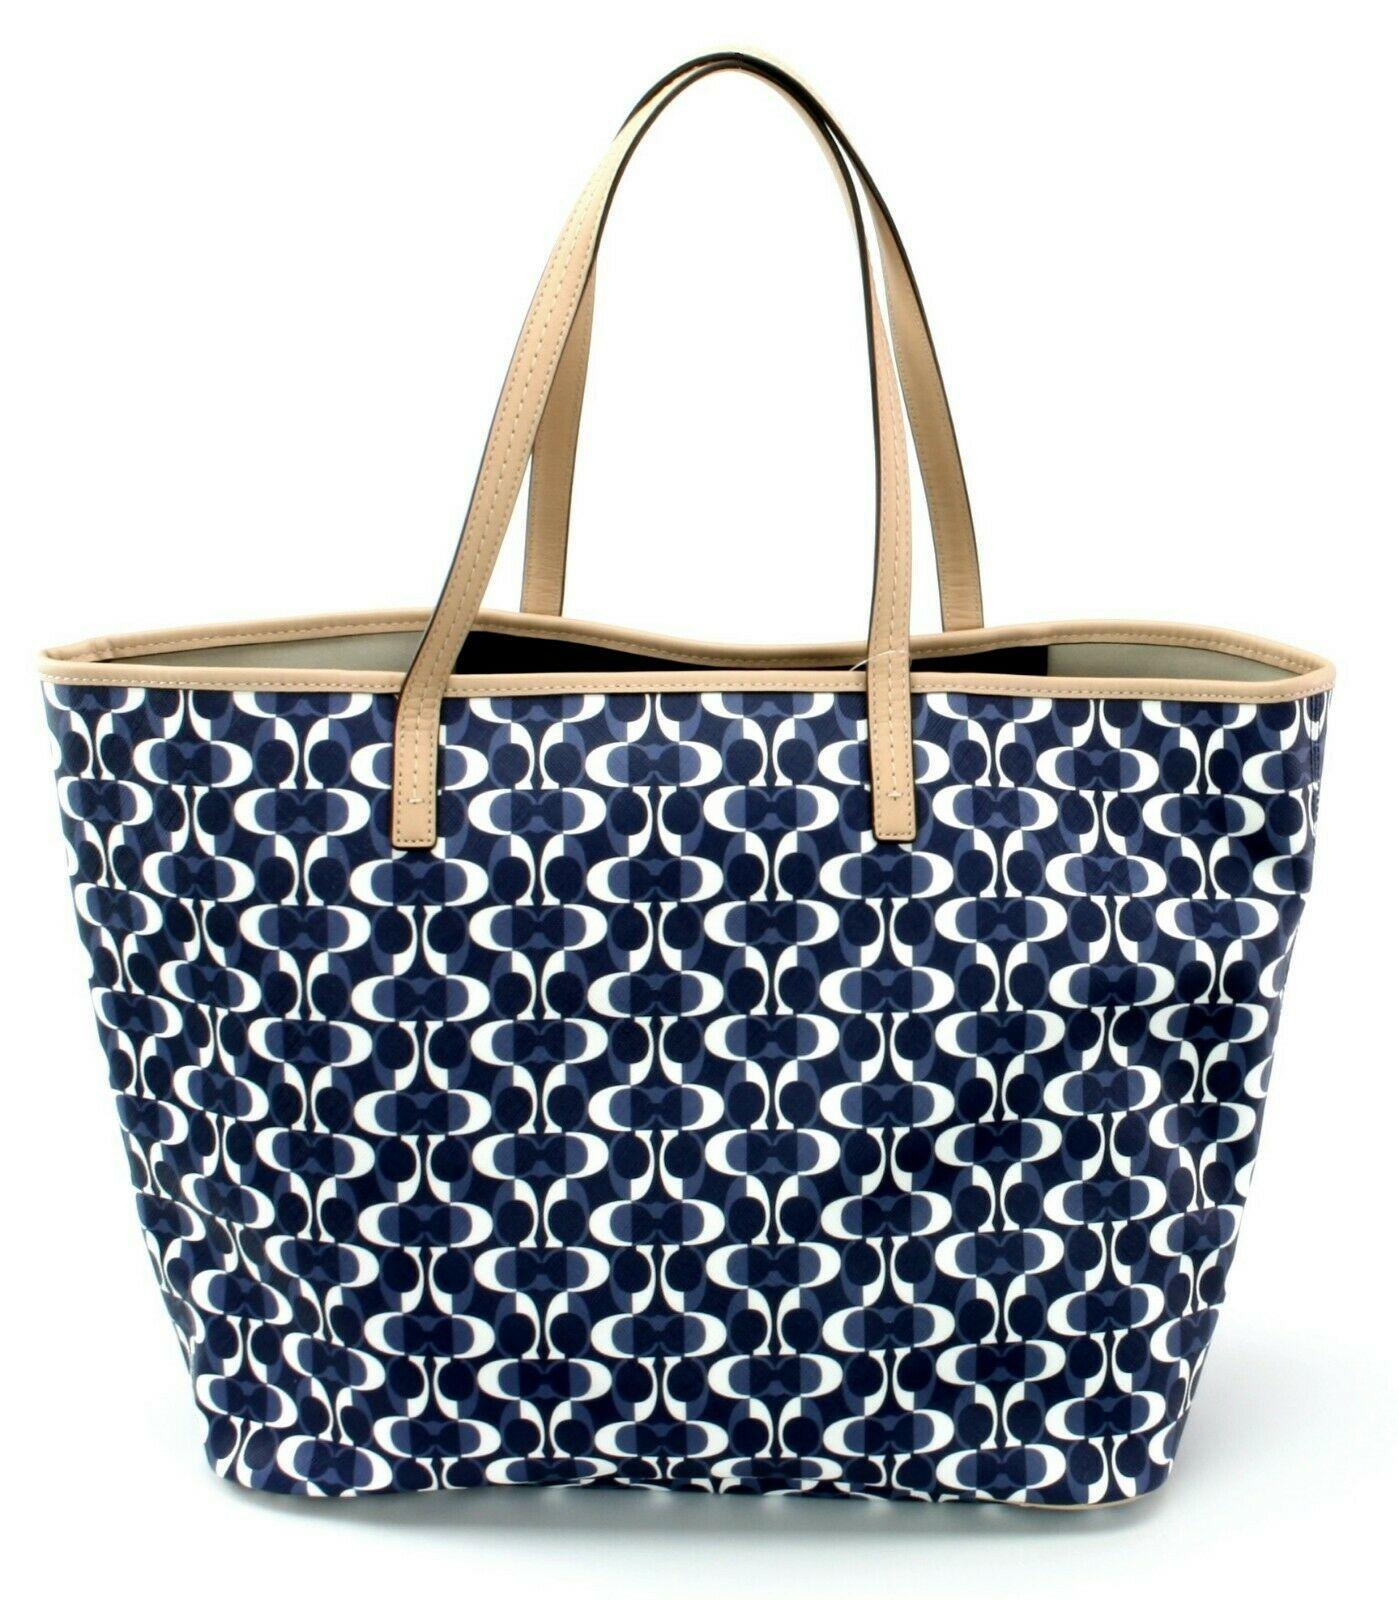 Coach Monogrammed Shopper Tote Bag PVC Large Handbag Navy & Tan RRP £330